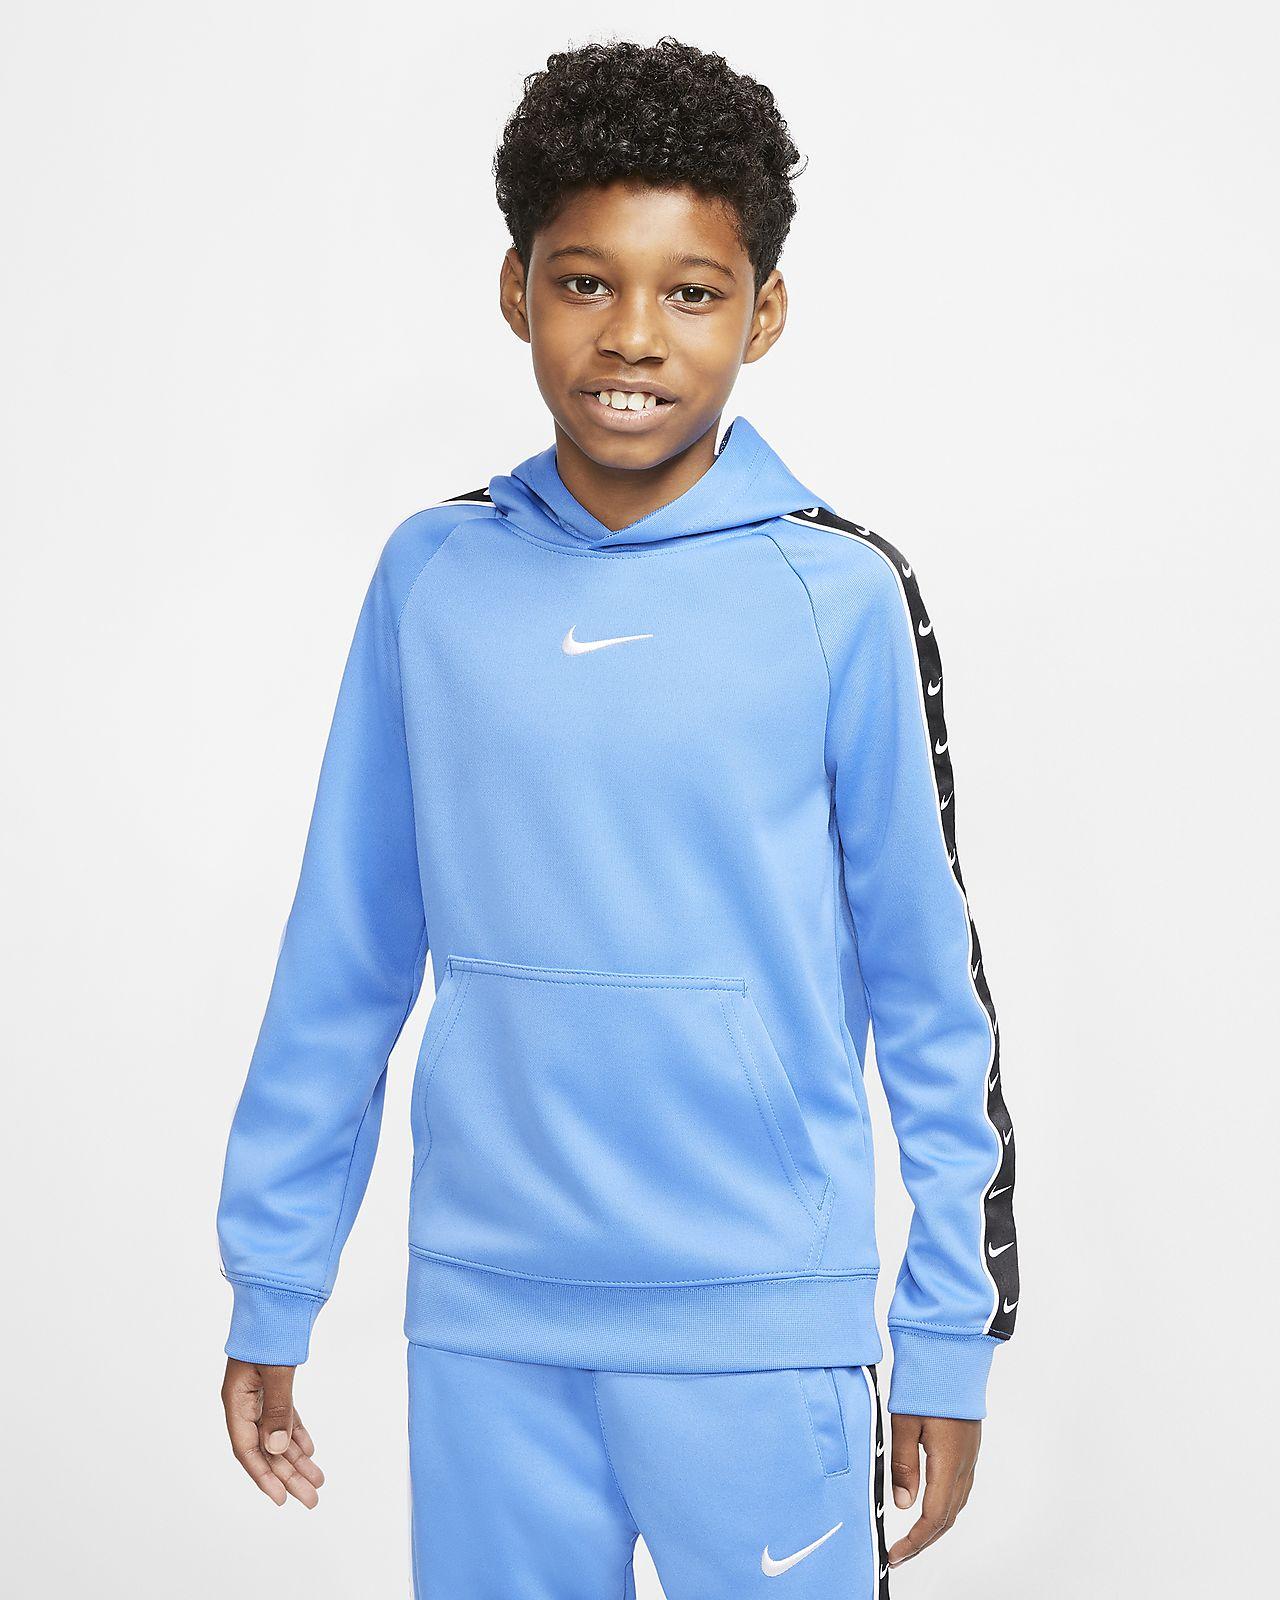 Nike Sportswear Swoosh Older Kids' Hoodie